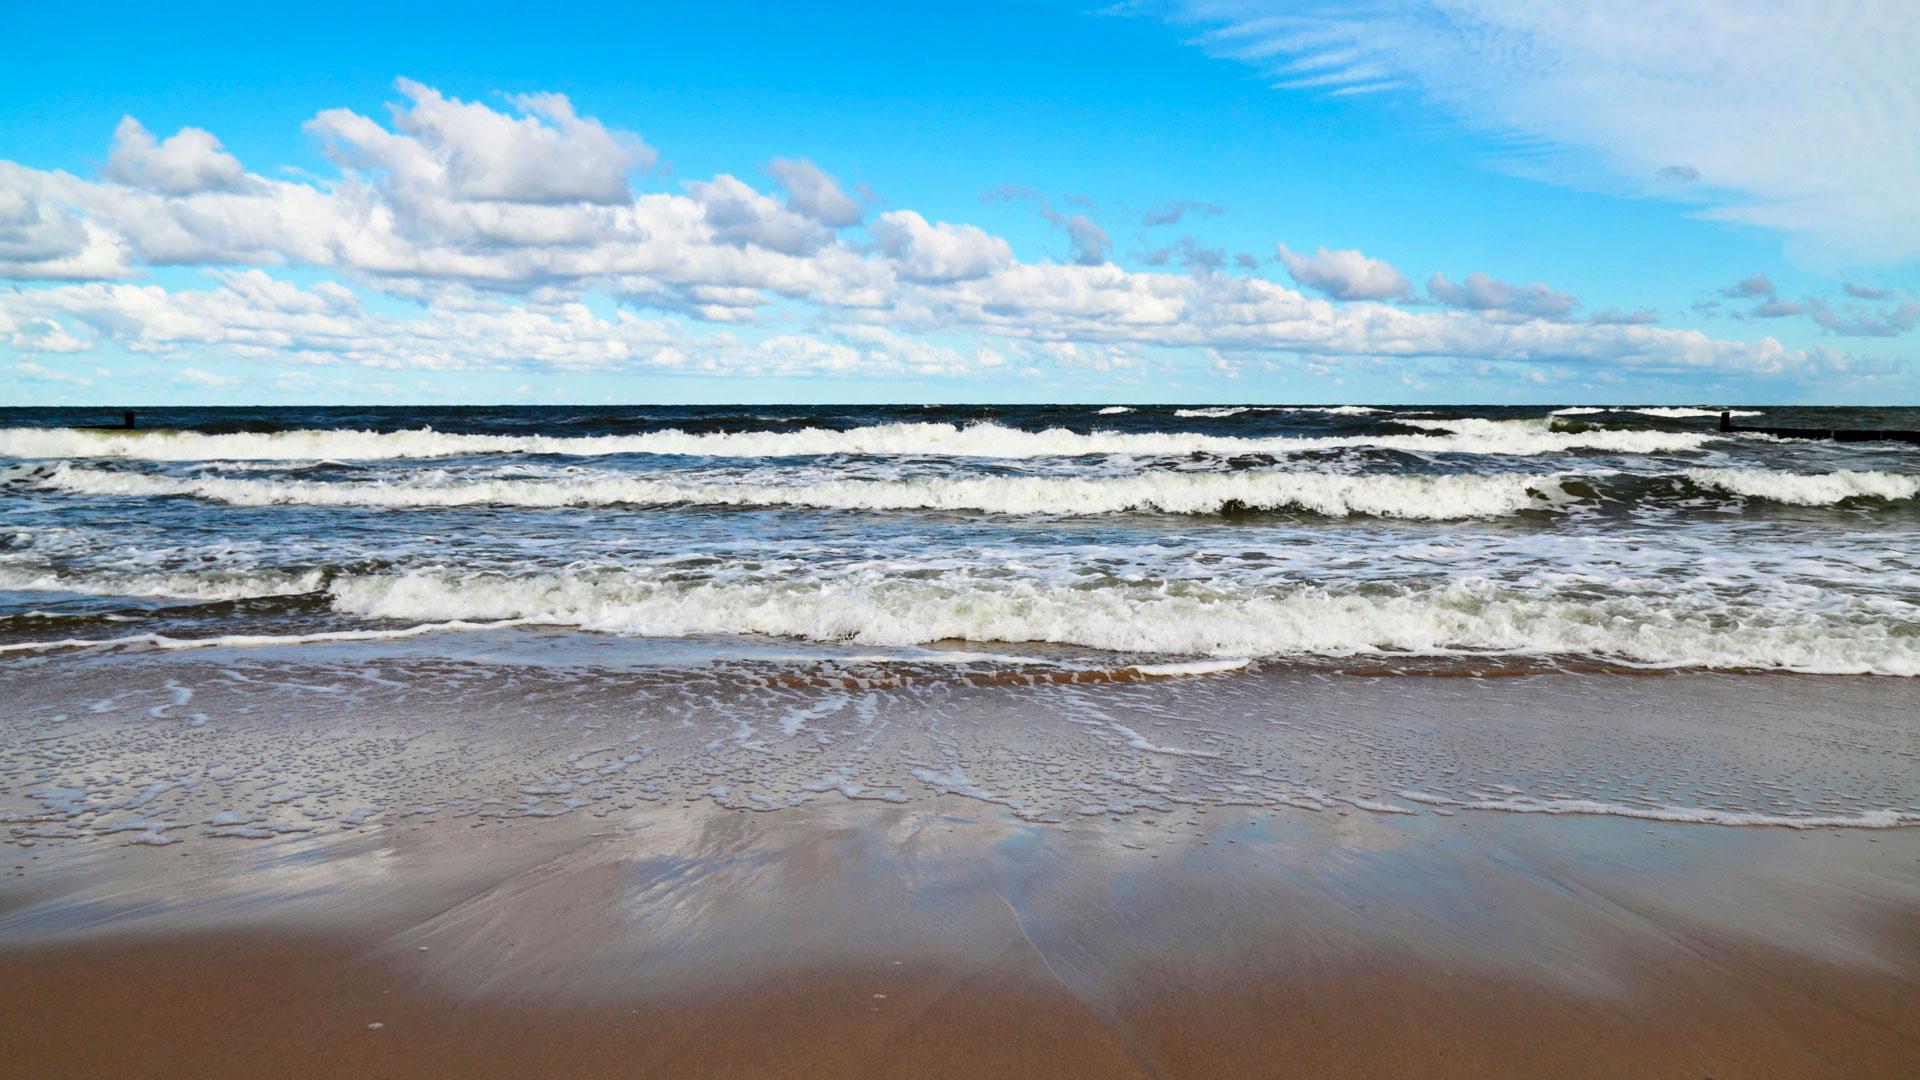 Обои волны океана картинки обои для